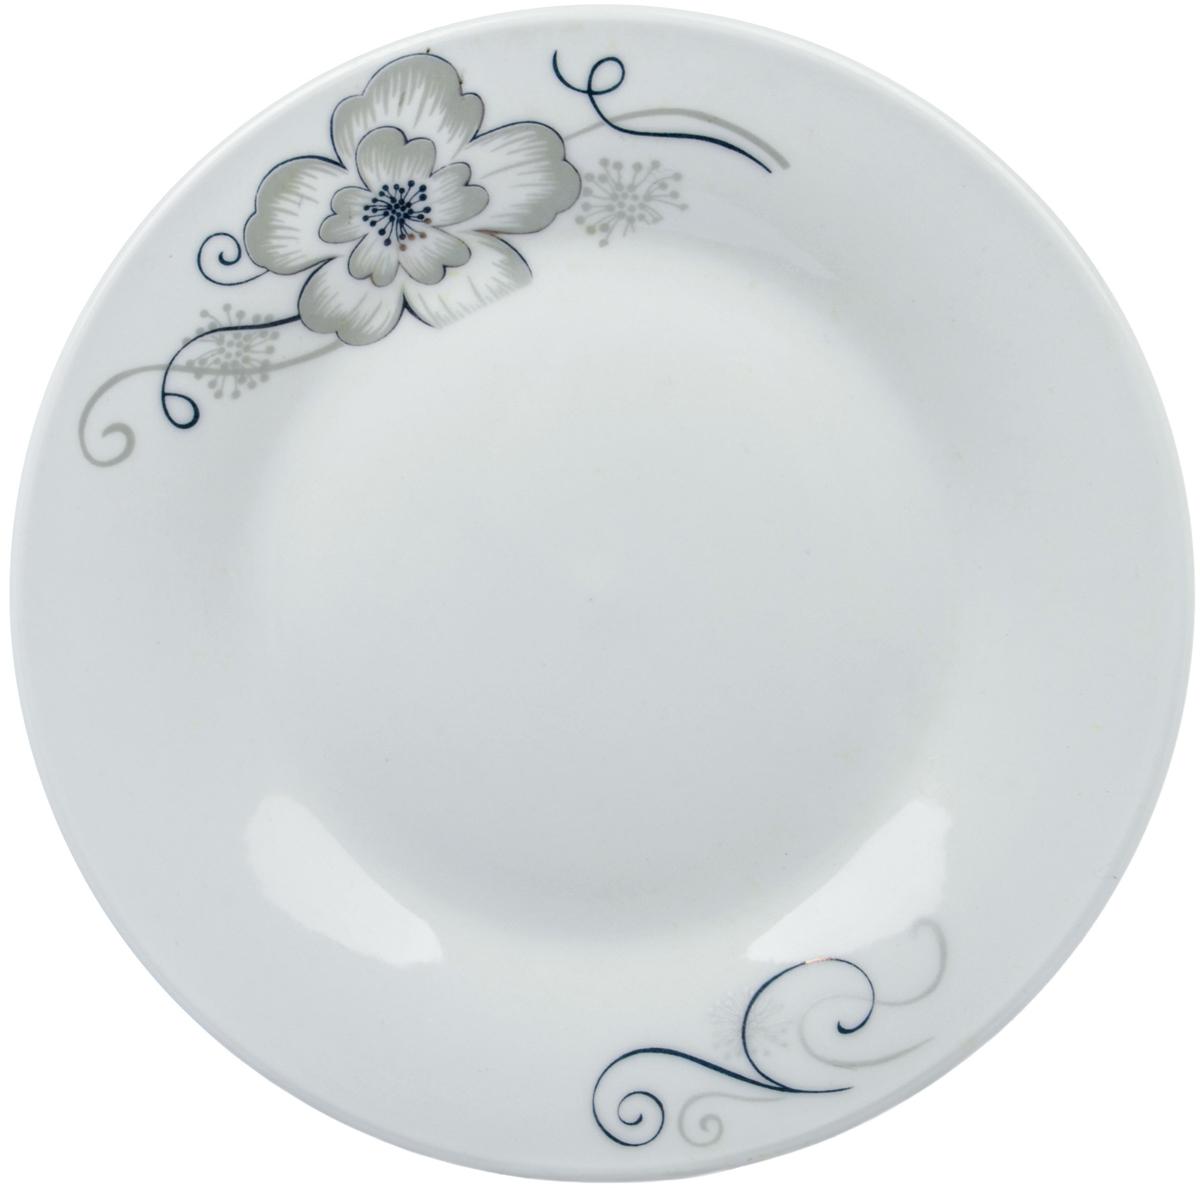 Тарелка Ningbo Royal Серый цветок, диаметр 15 см посуда из фарфора оптом